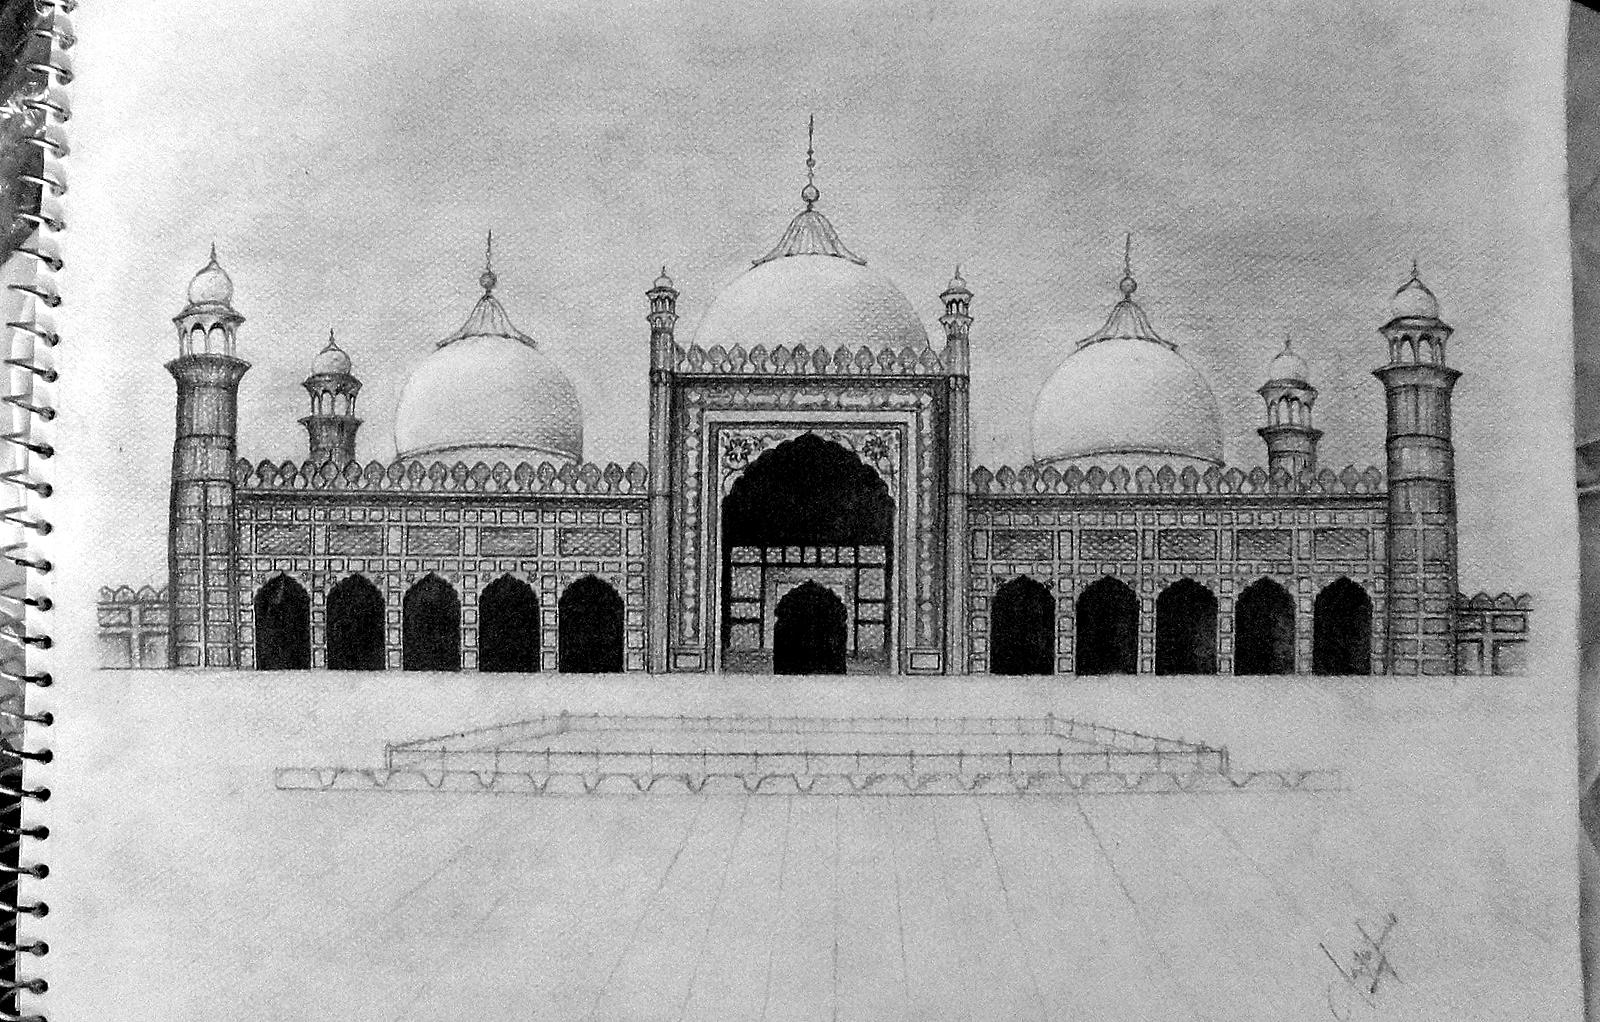 Badshahi mosque minar e pakistan